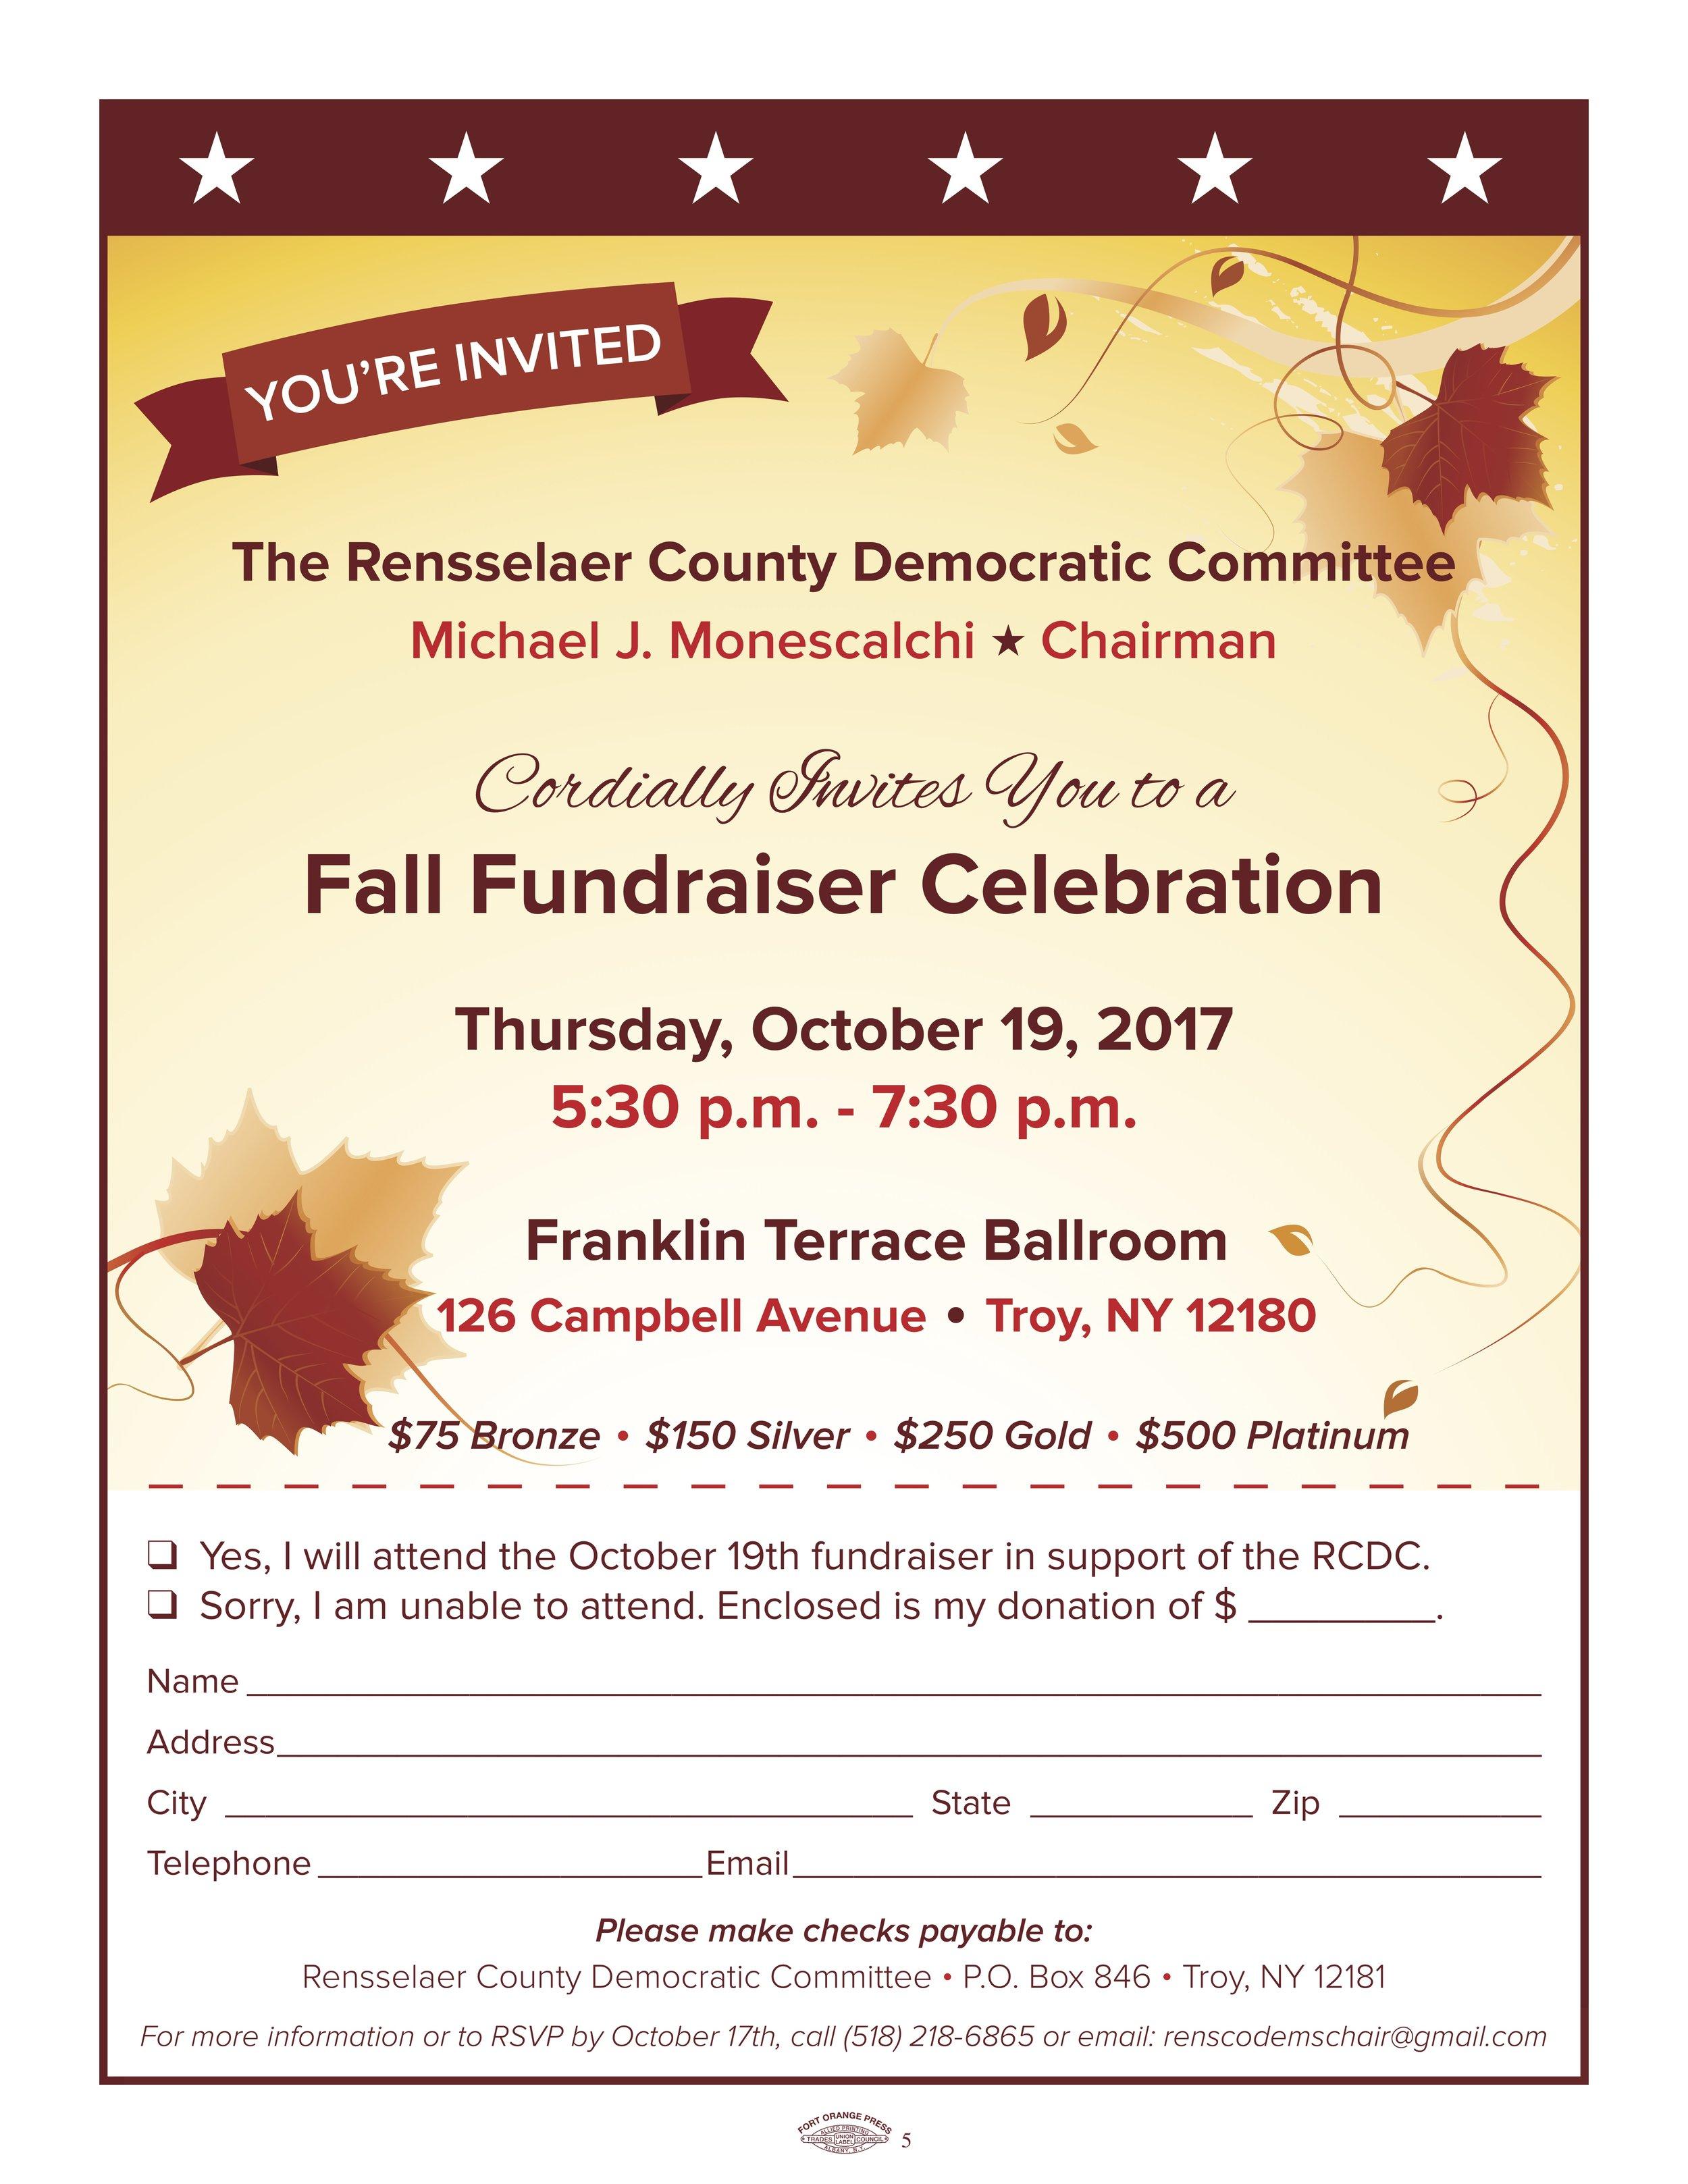 RCDC Fall 2017 Fundraiser Invitation.jpg